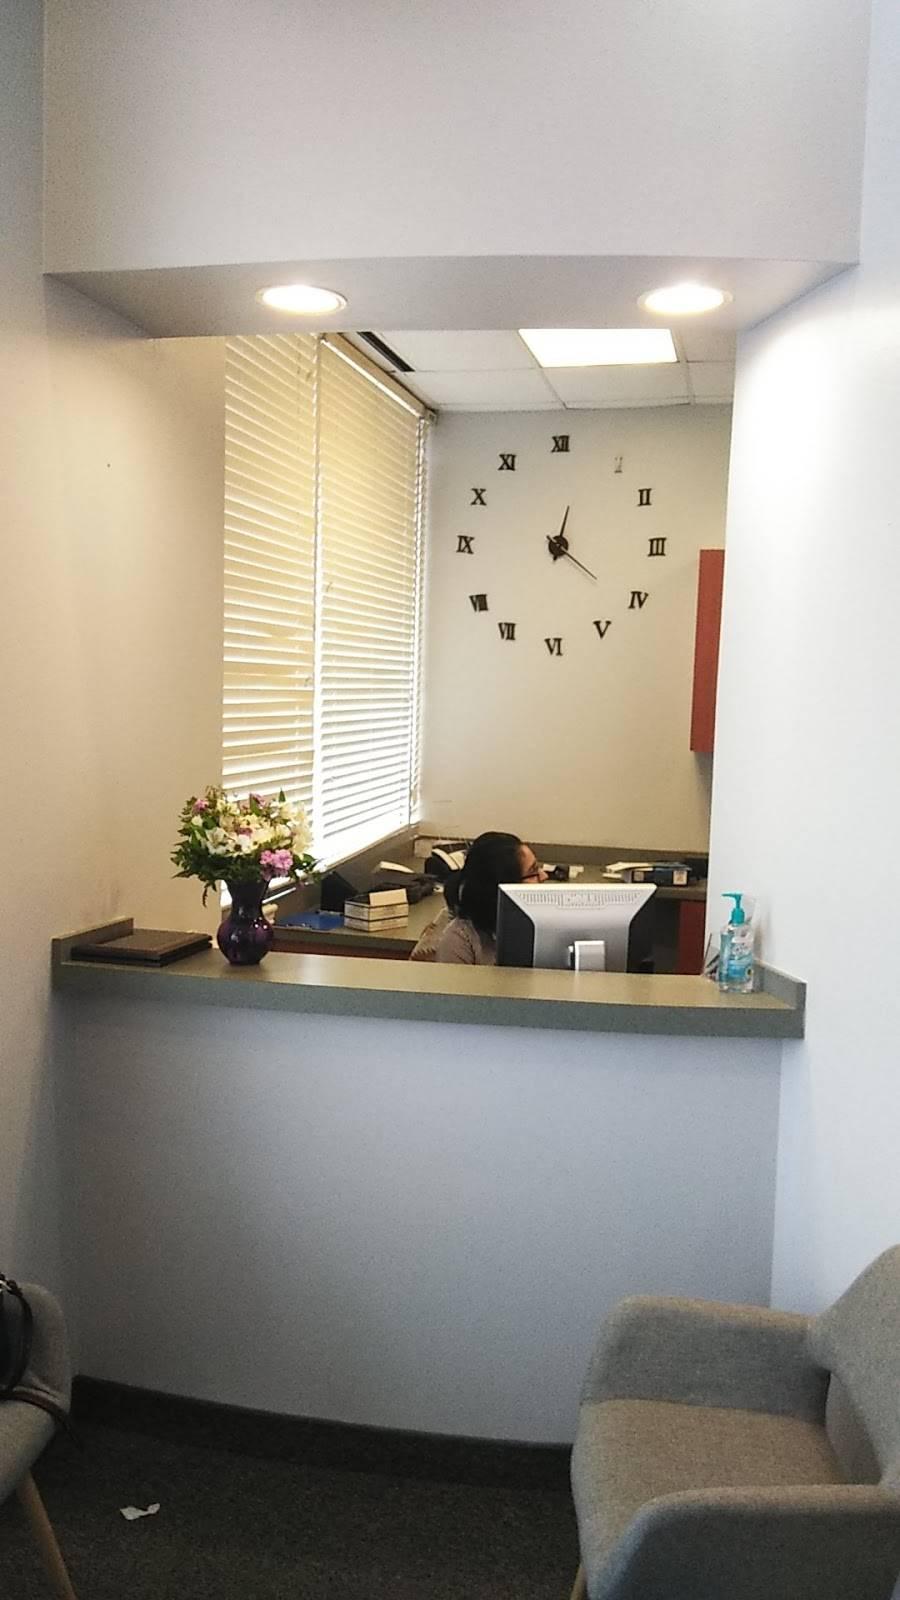 Dental Hub - dentist  | Photo 3 of 9 | Address: 3483 W, FM 544 SUITE 112, Wylie, TX 75098, USA | Phone: (972) 371-0441